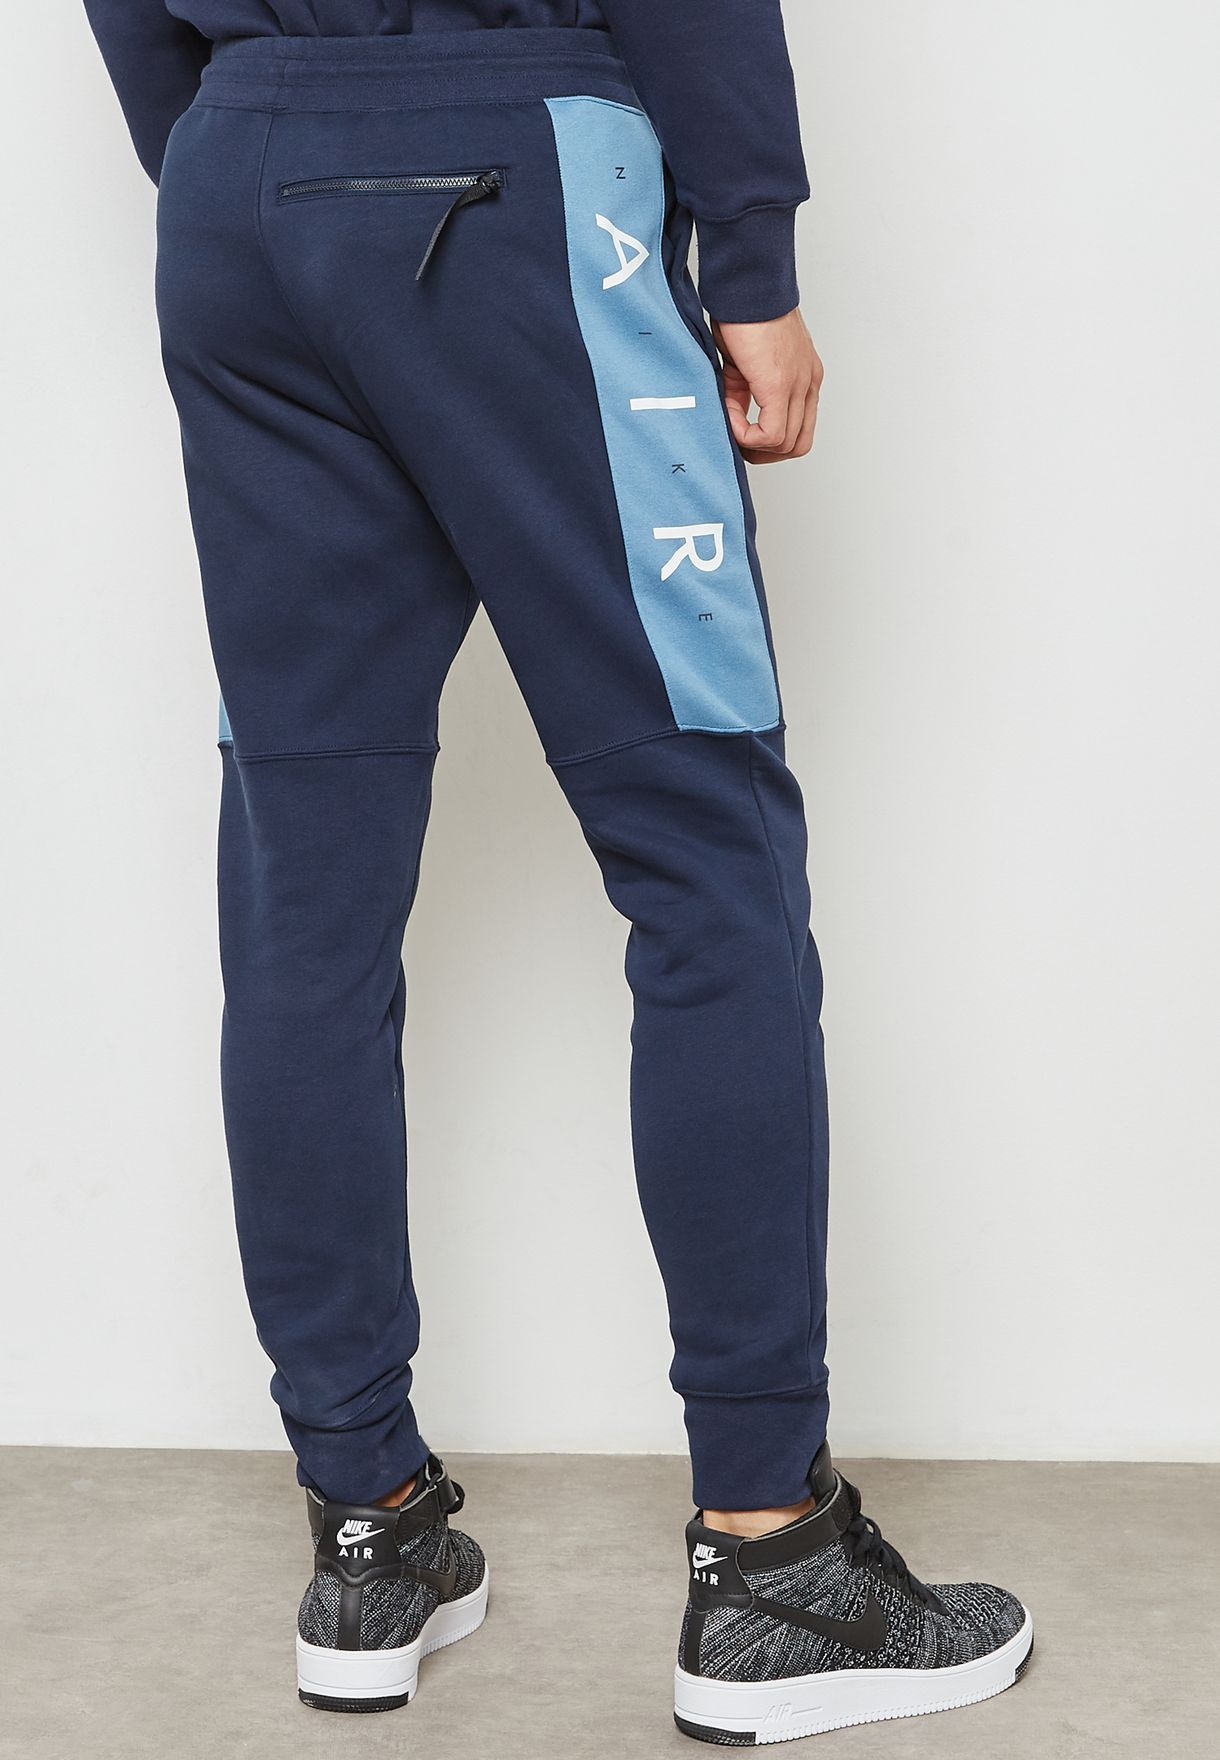 bae7d86af1f Shop Nike navy Air Fleece Sweatpants 886048-451 for Men in Saudi ...